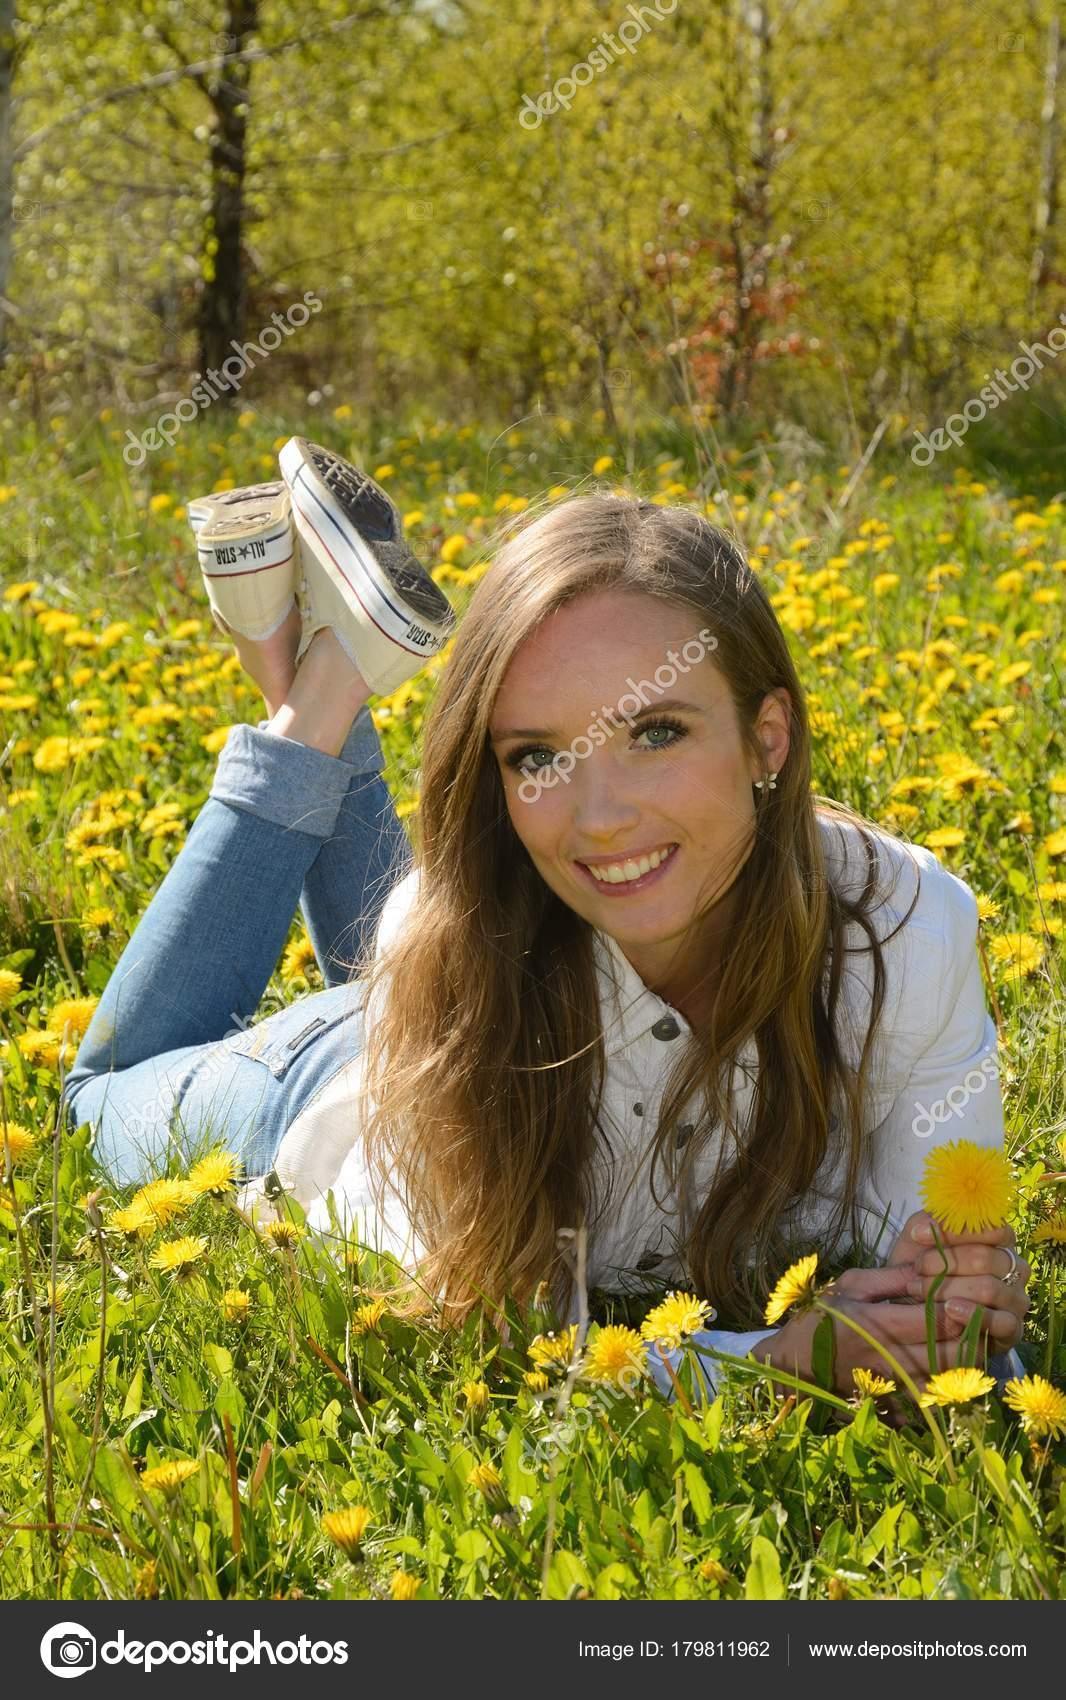 1f2e128b9bf Όμορφη Νεαρή Γυναίκα Που Βρίσκεται Ανάμεσα Λουλούδια Πικραλίδα Ένα ...